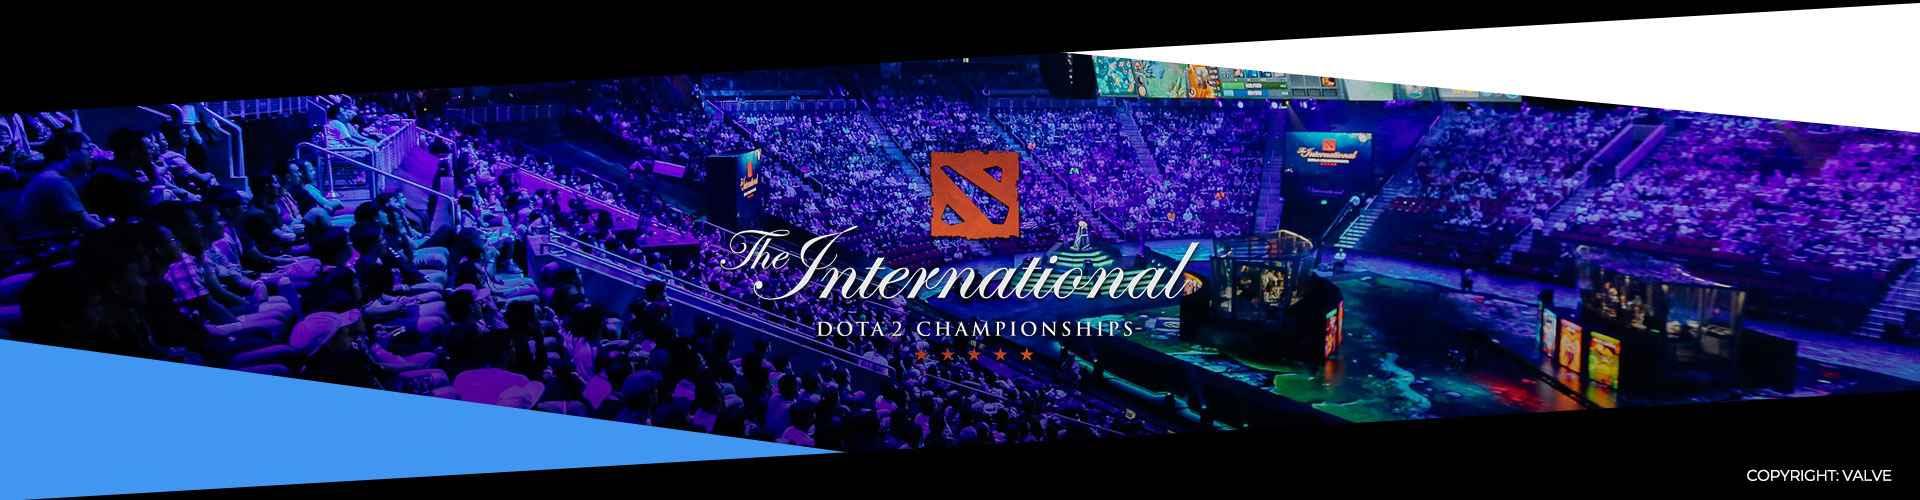 Dota 2 The International 2019